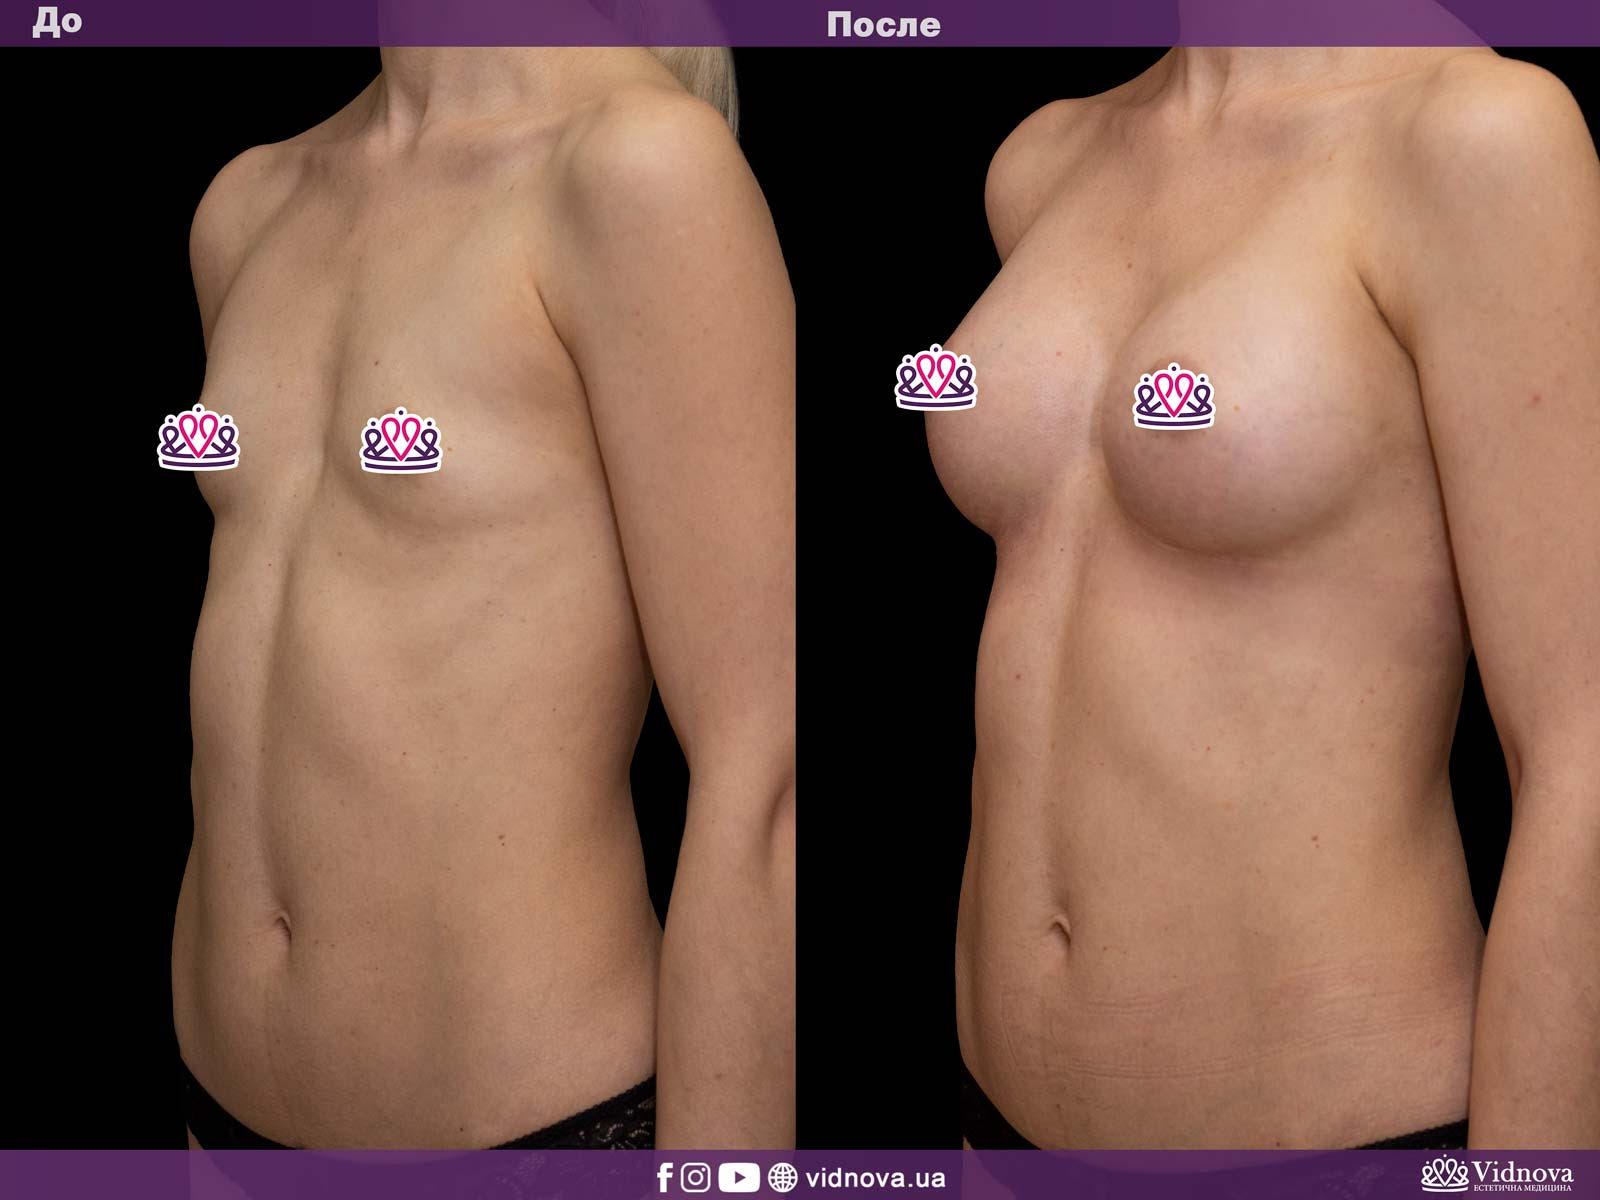 Увеличение груди: Фото ДО и ПОСЛЕ - Пример №12-3 - Клиника Vidnova